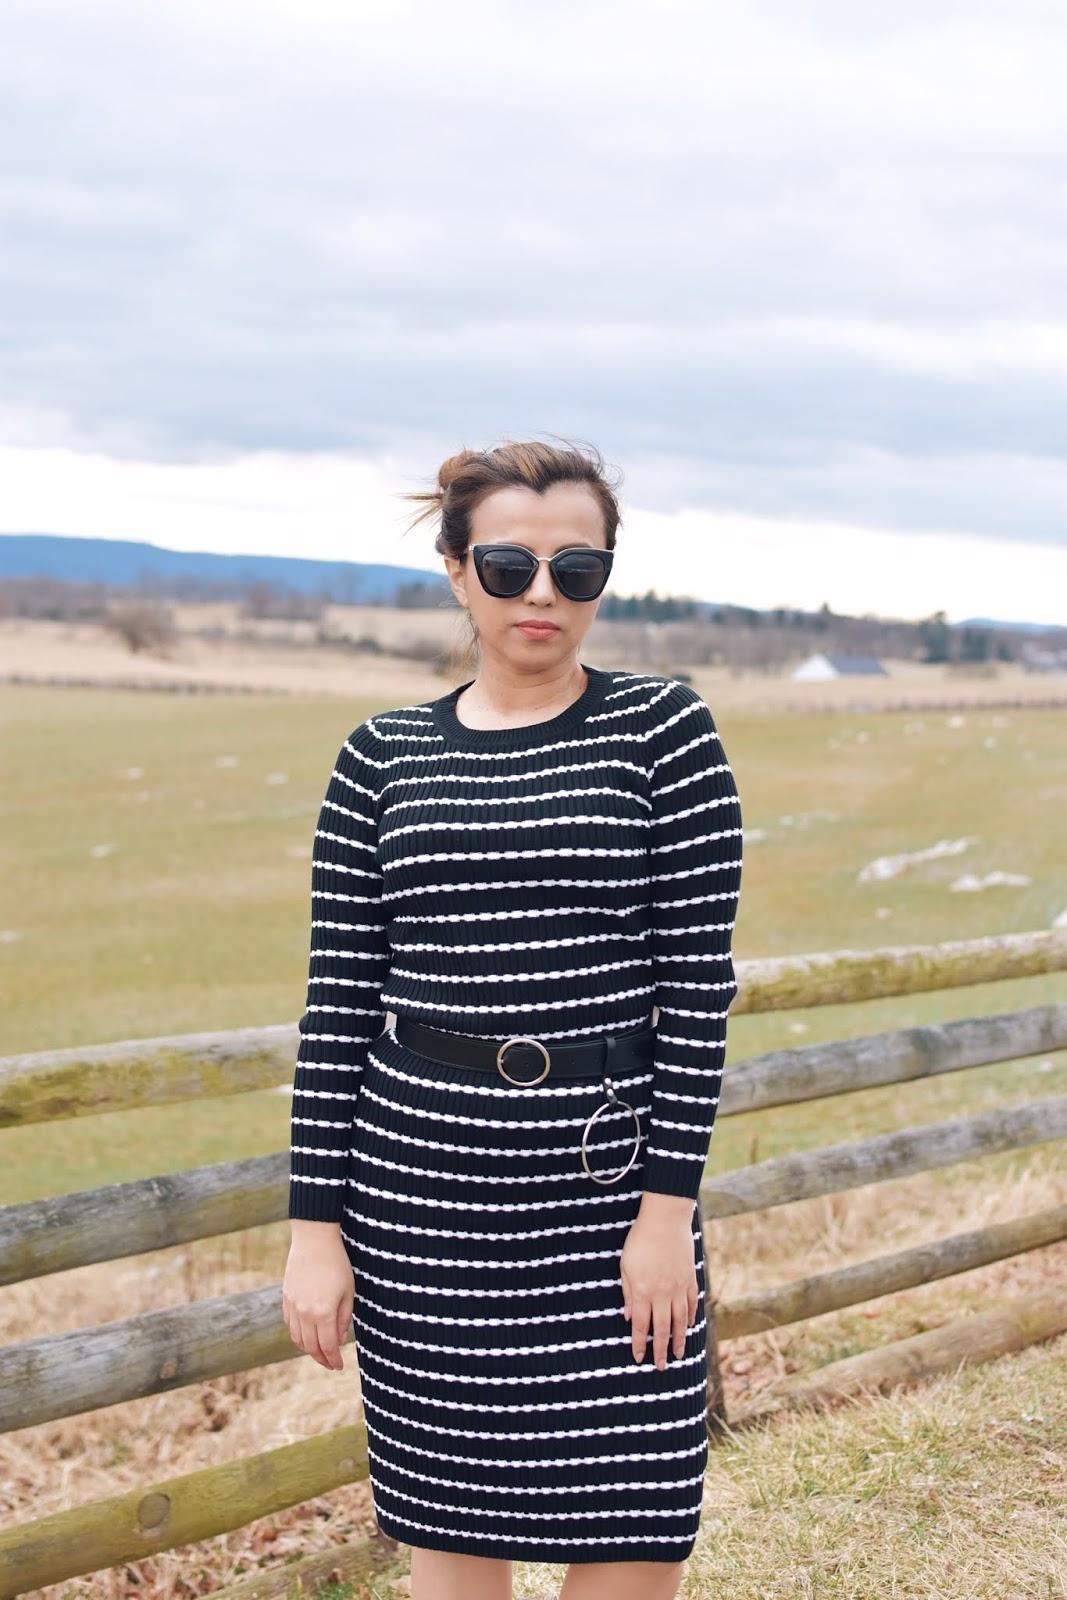 Antietam National Battlefield Maryland by Mari Estilo-lookbookstore-travelblogger-mariestilotravels-travelblogger-traveller-